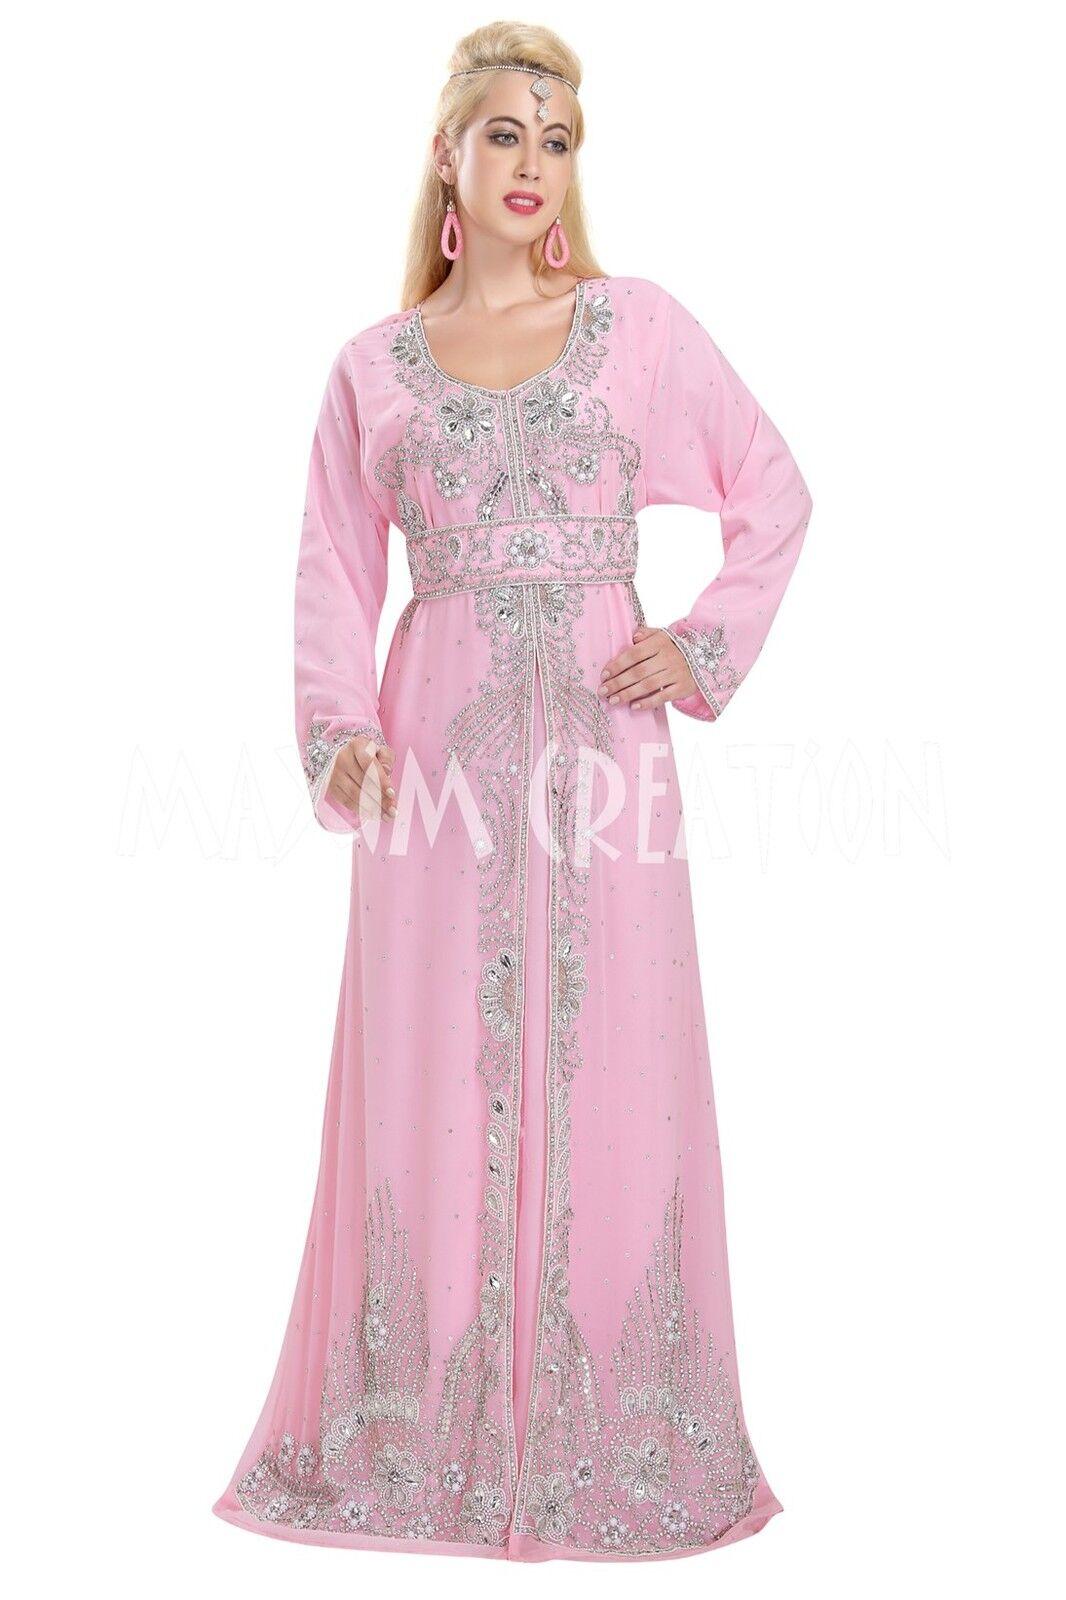 DUBAI KAFTAN WEDDING GOWN GOWN GOWN DESIGN FOR WOMEN BY MAXIM CREATION 5845 d72827